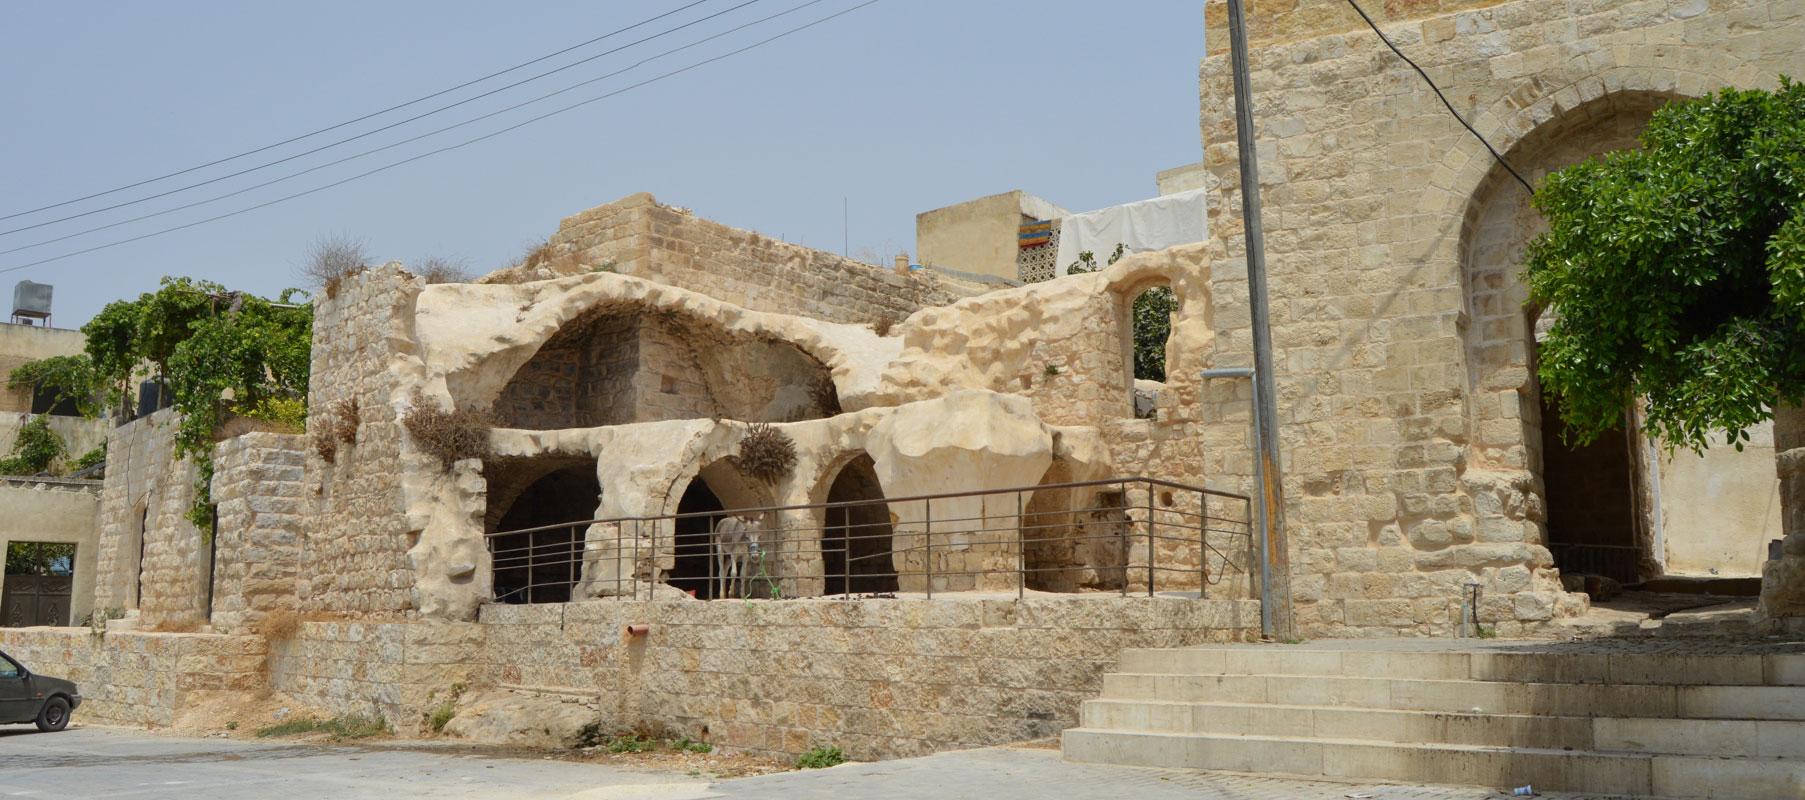 Jammain, Palestine